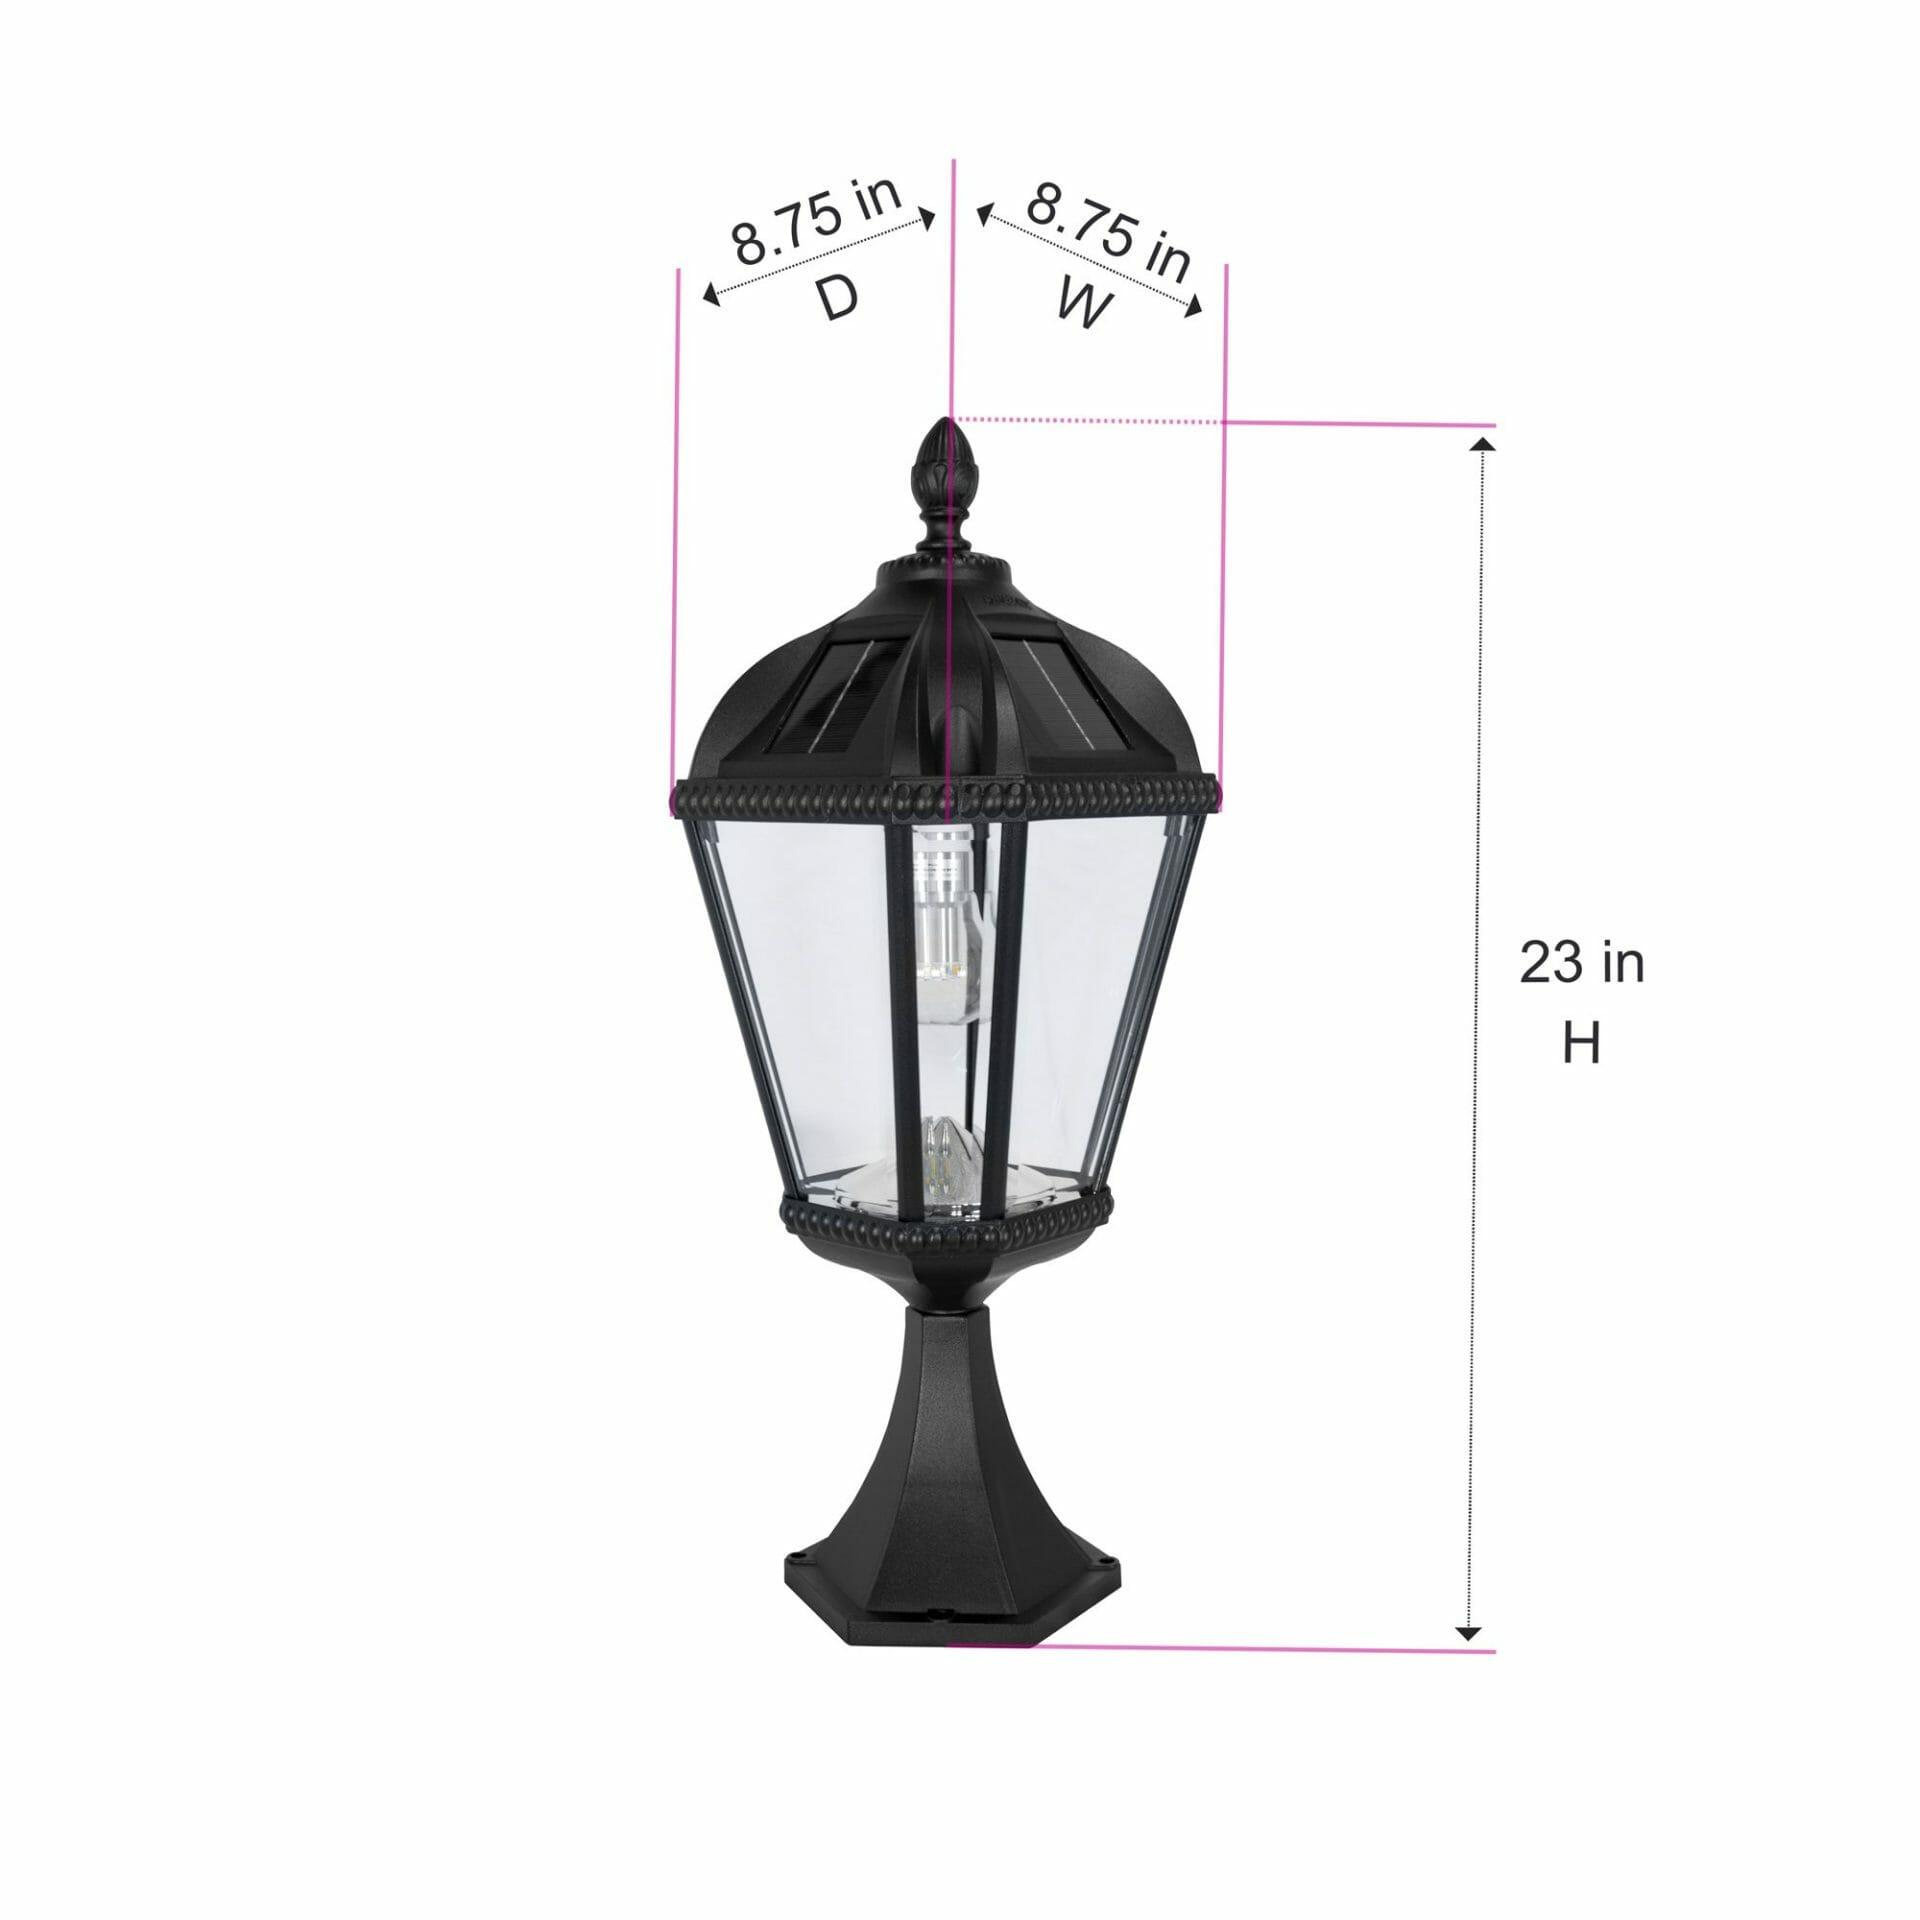 Royal Bulb Pier Mount Solar Lamp - Dimensions